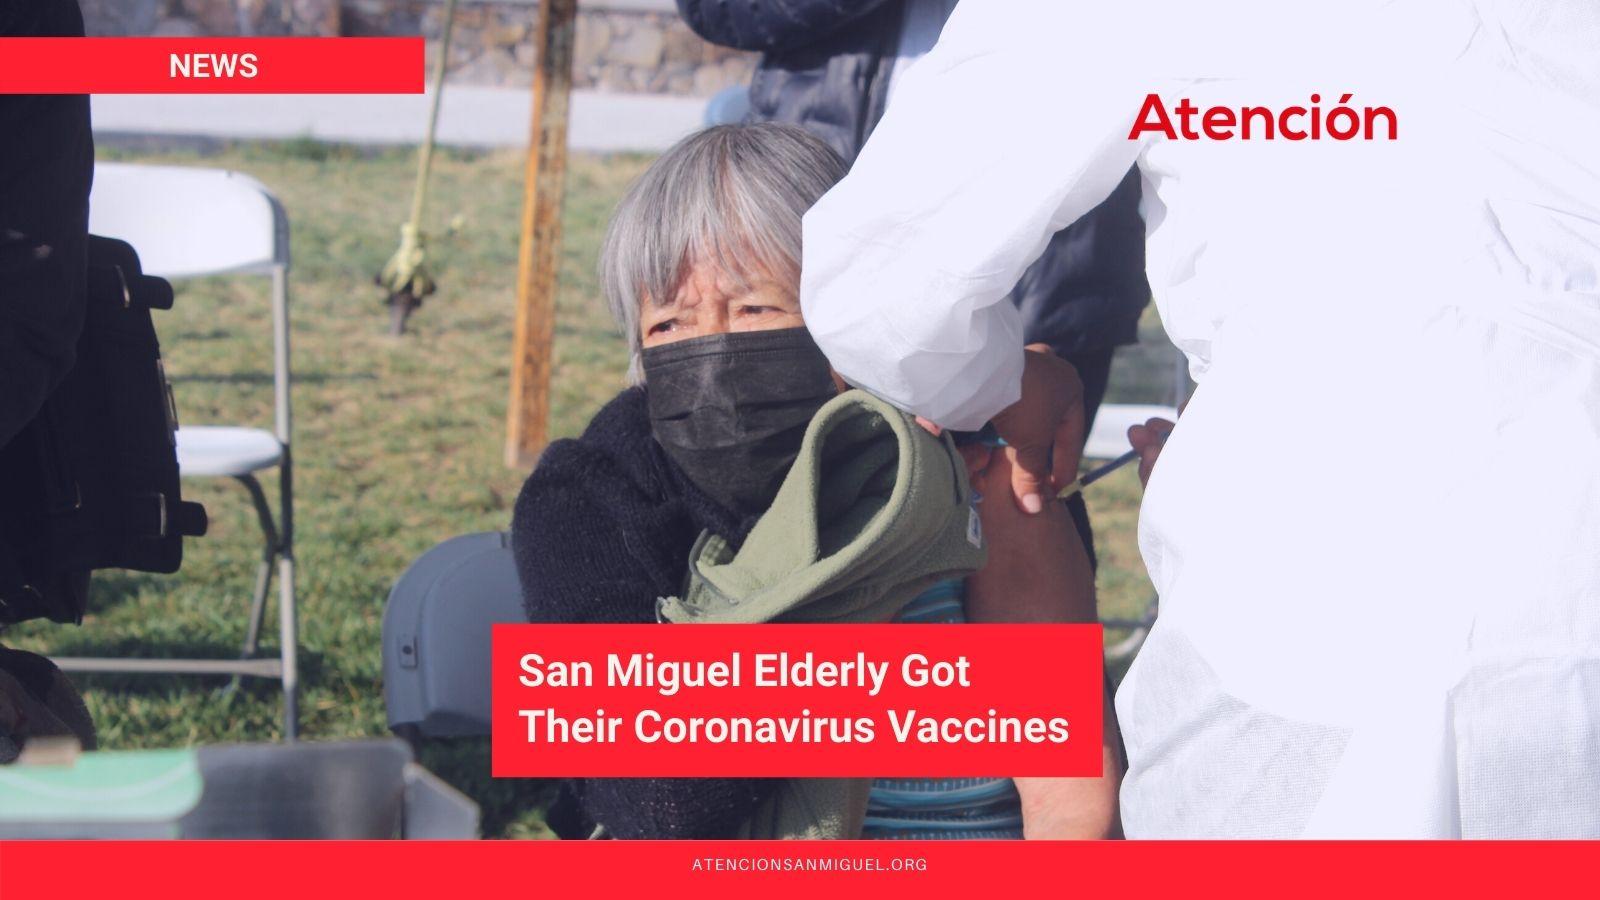 San-Miguel-Elderly-Got-Their-Coronavirus-Vaccines.jpg